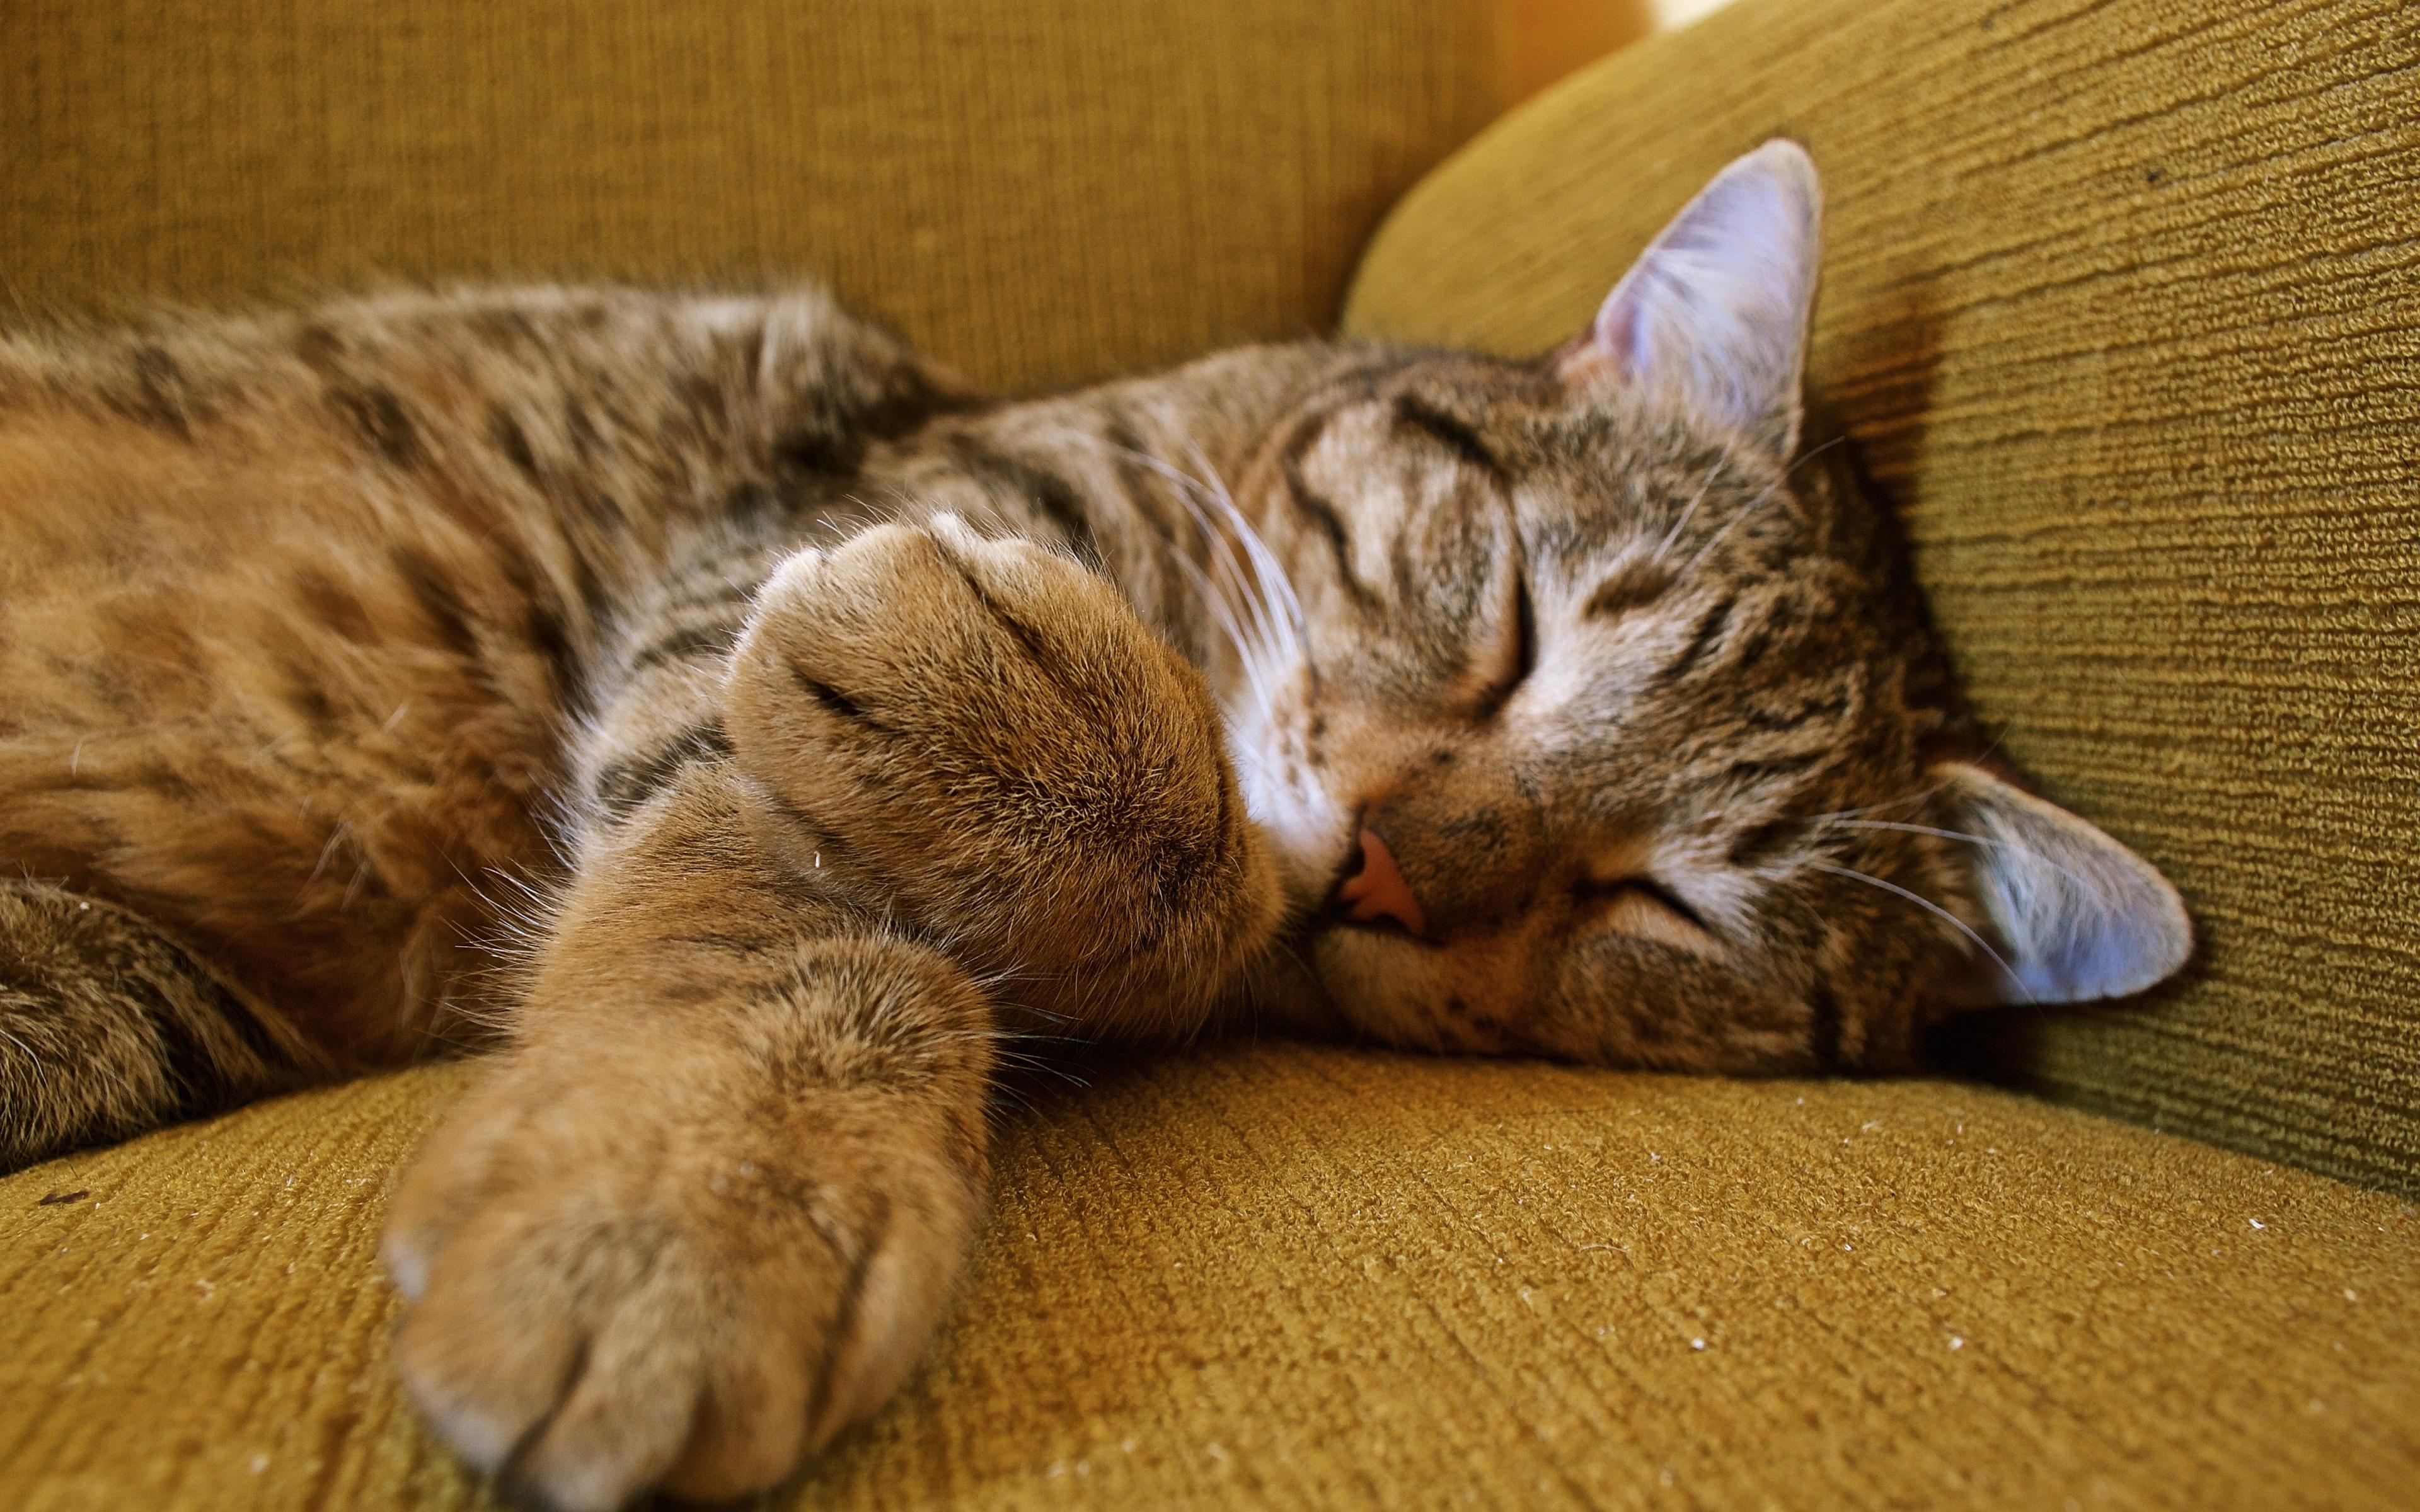 3840x2400 cat, sleeping, tabby UHD 4K 3840x2400 Resolution ...